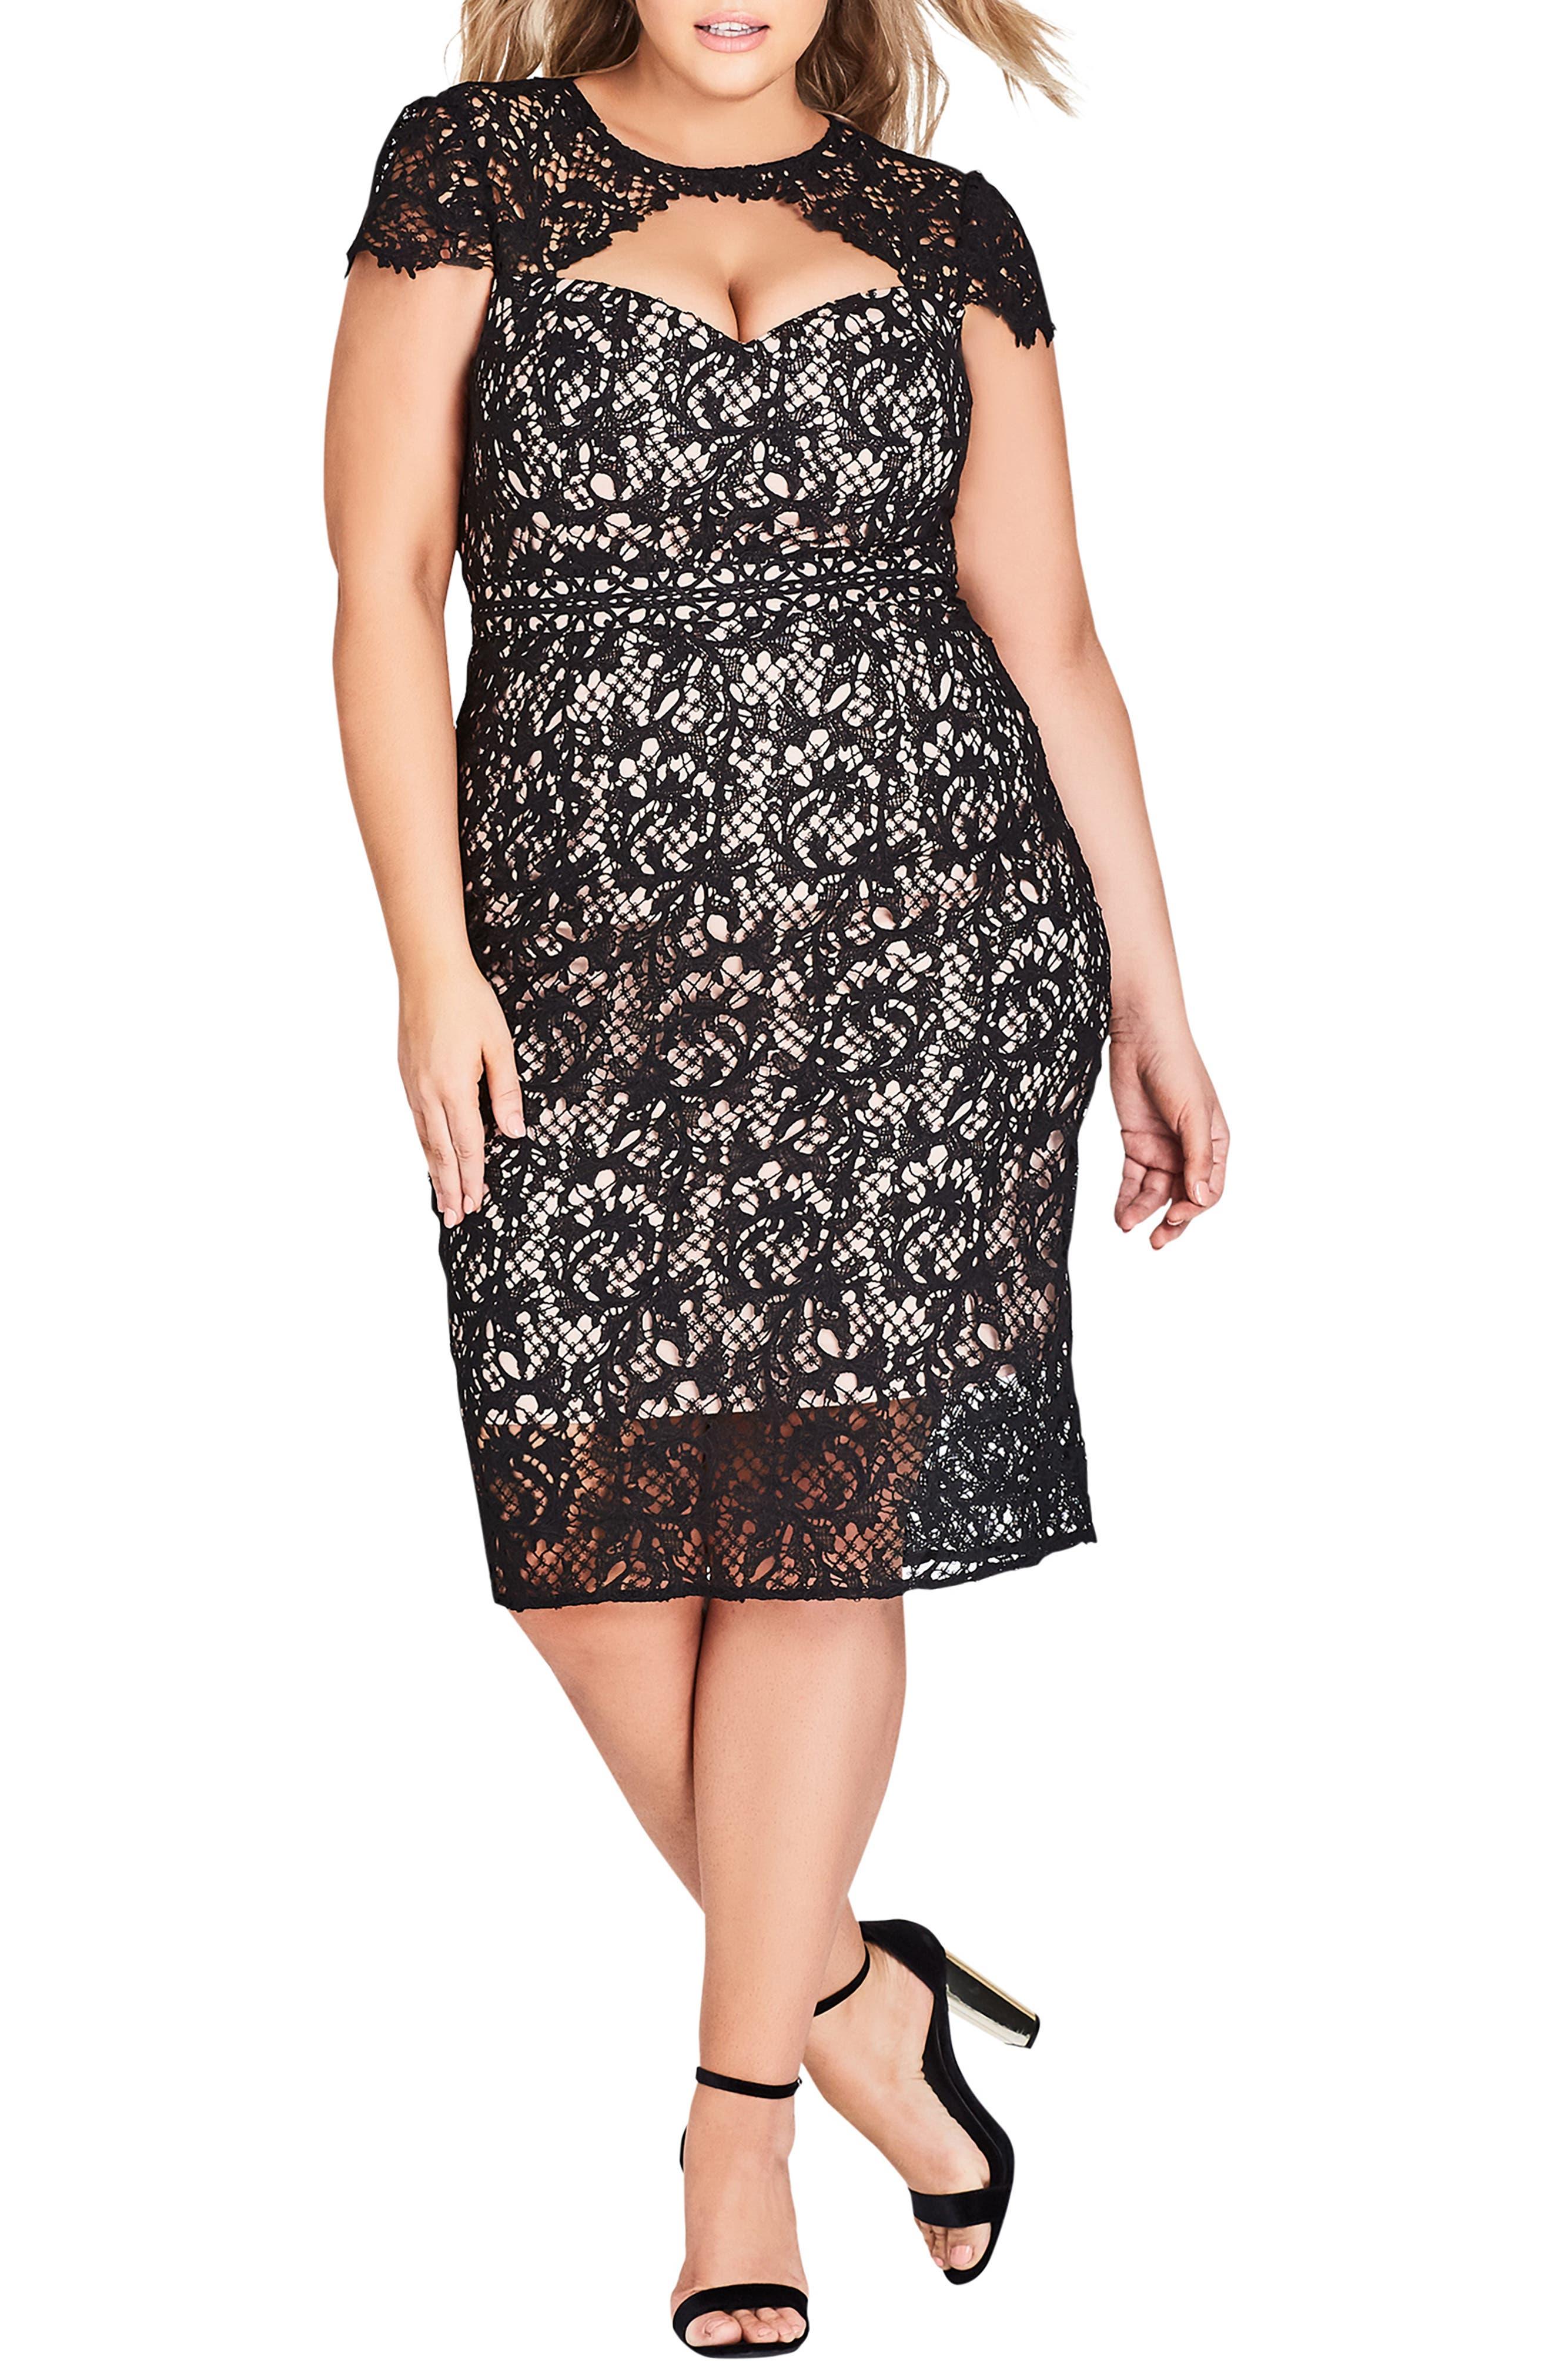 Plus Size City Chic Pretty Lace Sheath Dress, Black